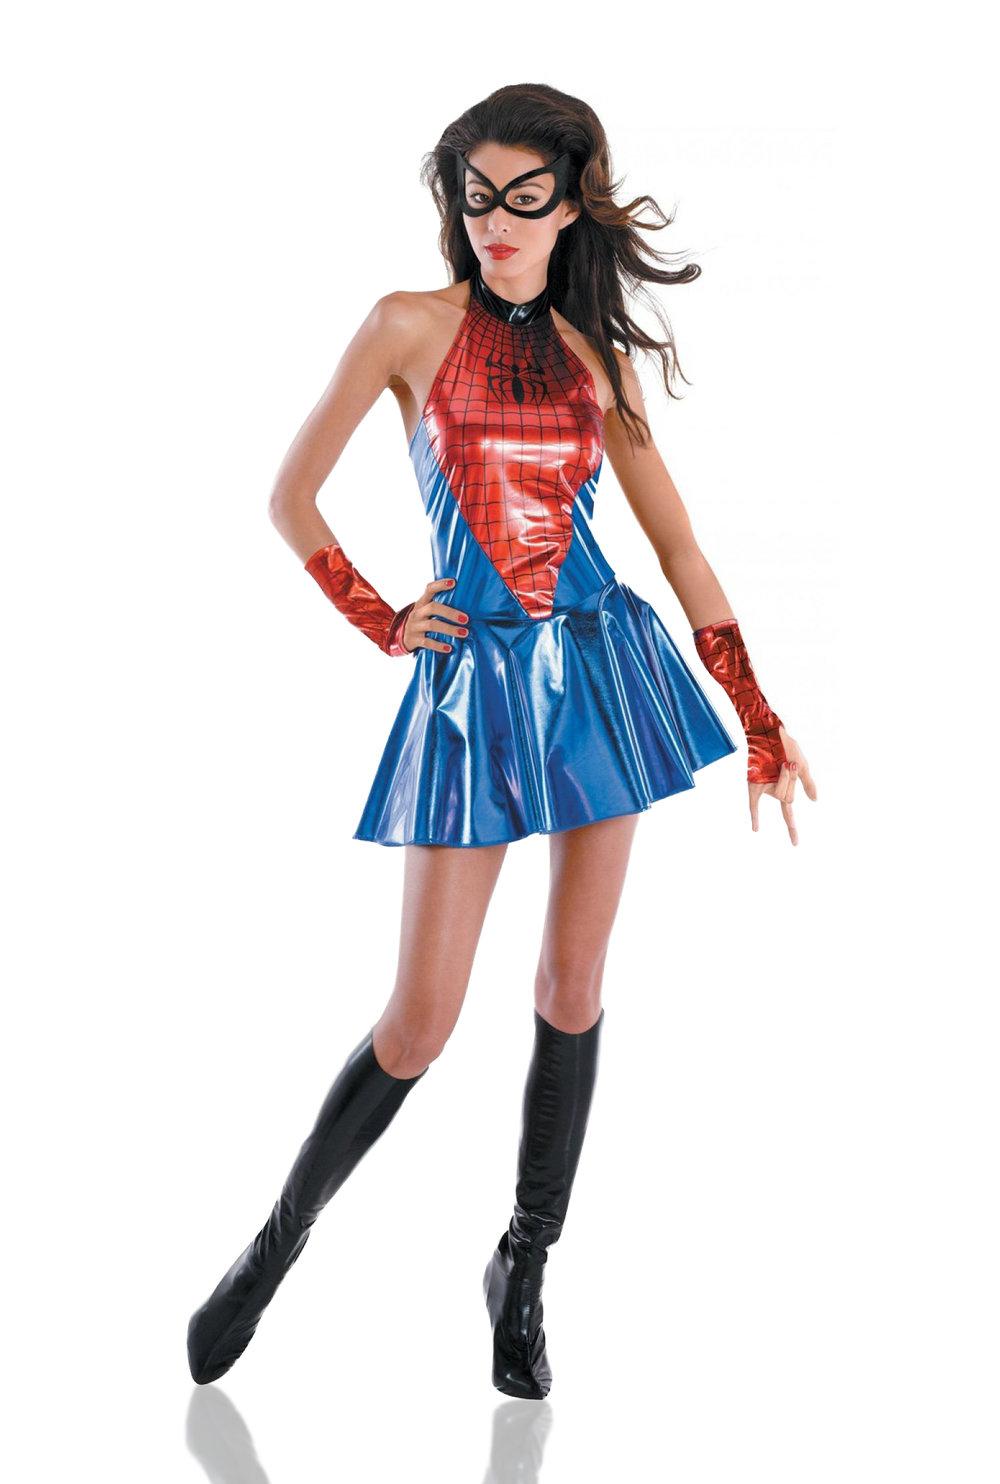 Entertainment_Women-of-Marvel-Fashion_Art_Director_Designer_Bryan_Barnes_1500_SL19.jpg